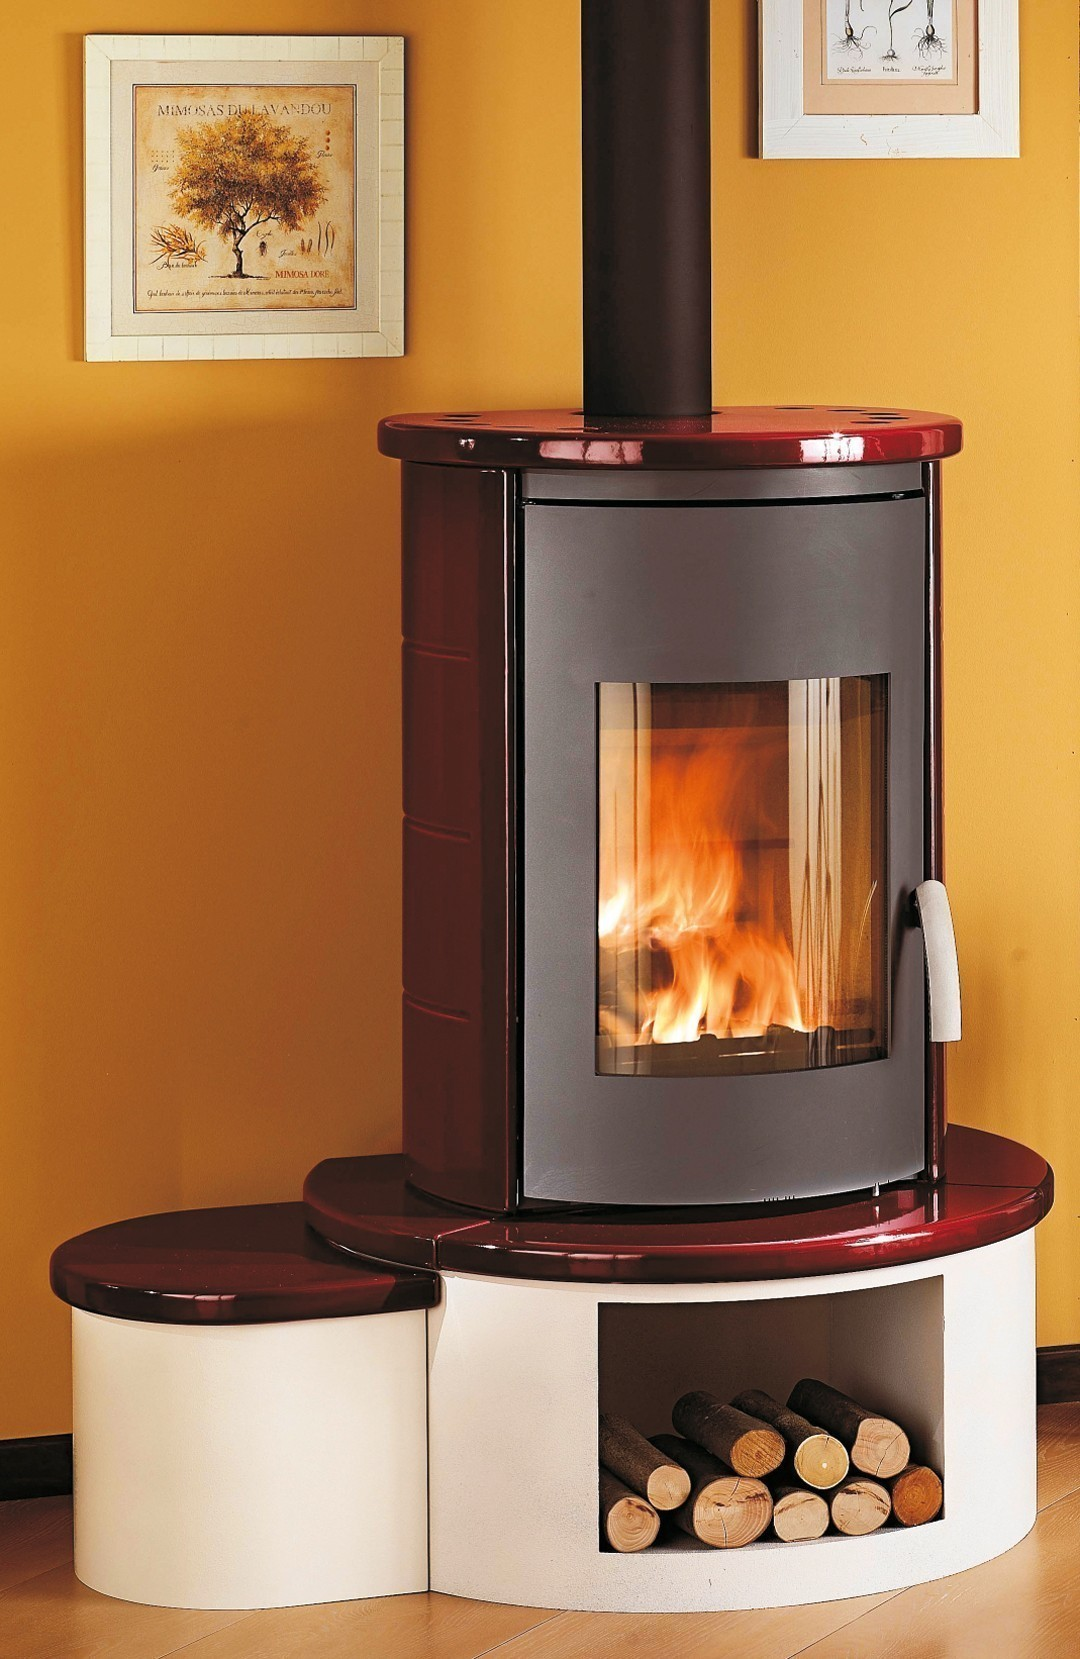 kaminofen wamsler kf 101 rona keramik bordeaux 8 kw bei. Black Bedroom Furniture Sets. Home Design Ideas